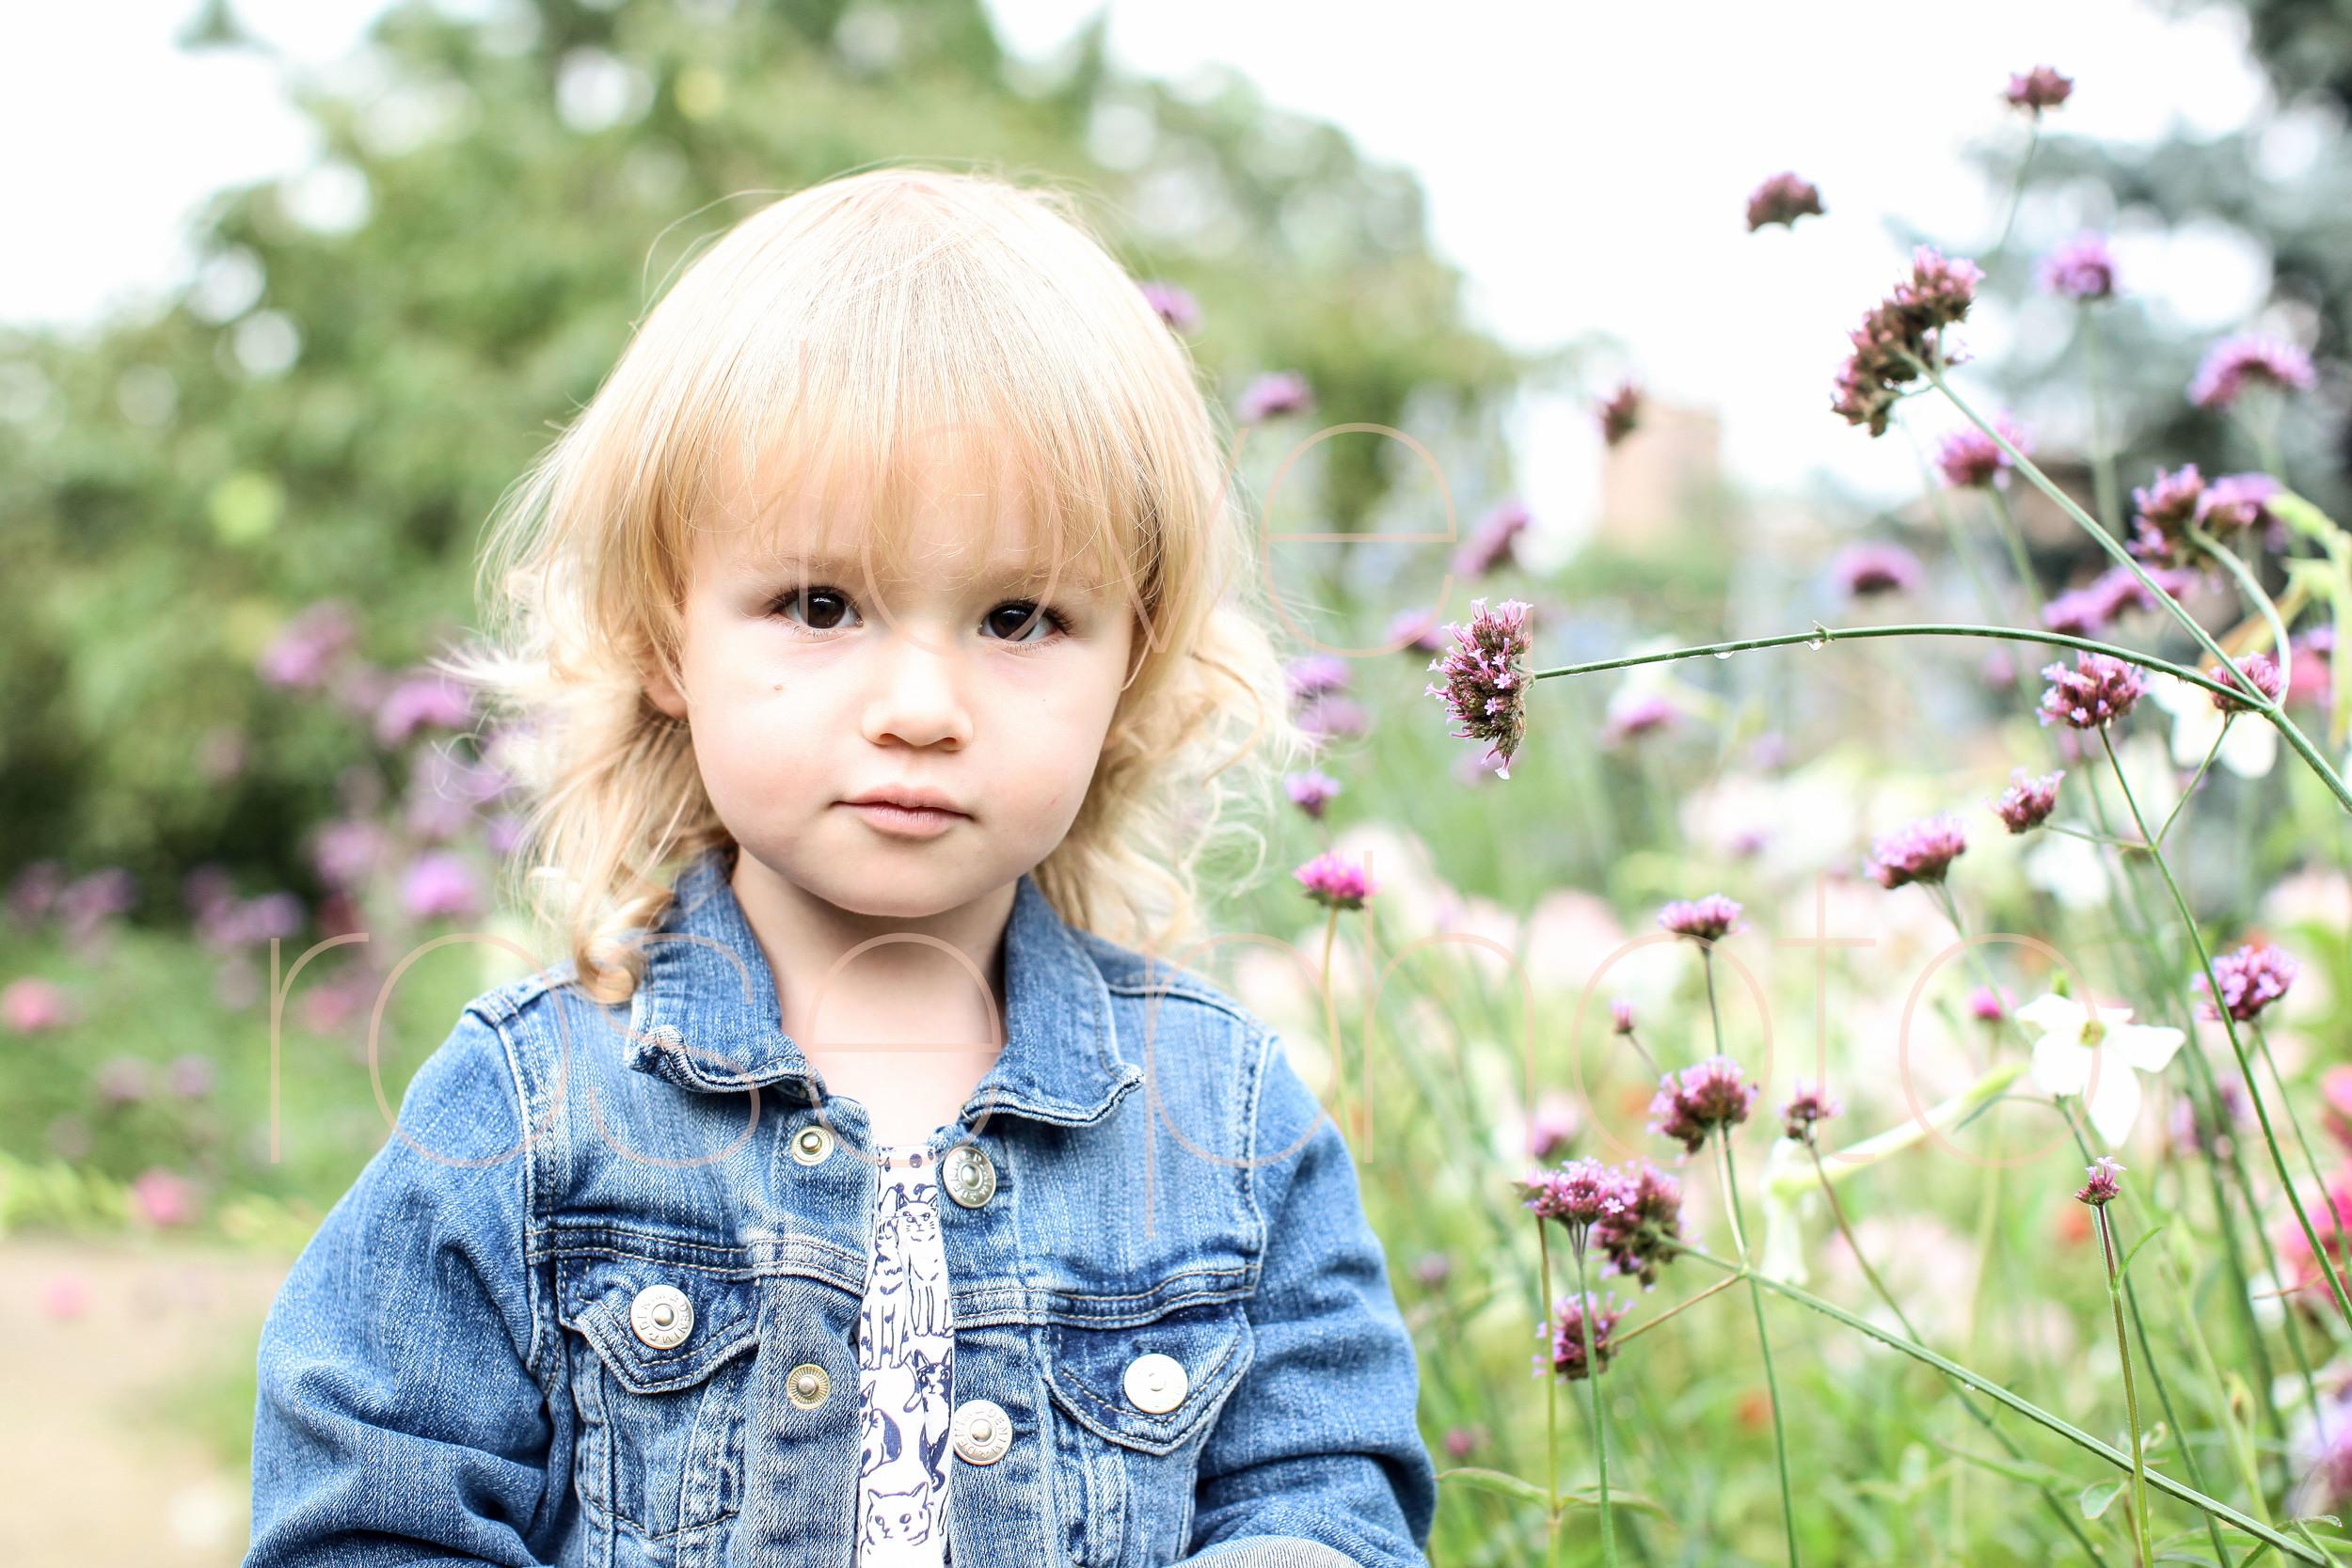 M jedrzejowski Summer 2015 Chicago childrens photographer lifestyle photography kids photos -001-002.jpg